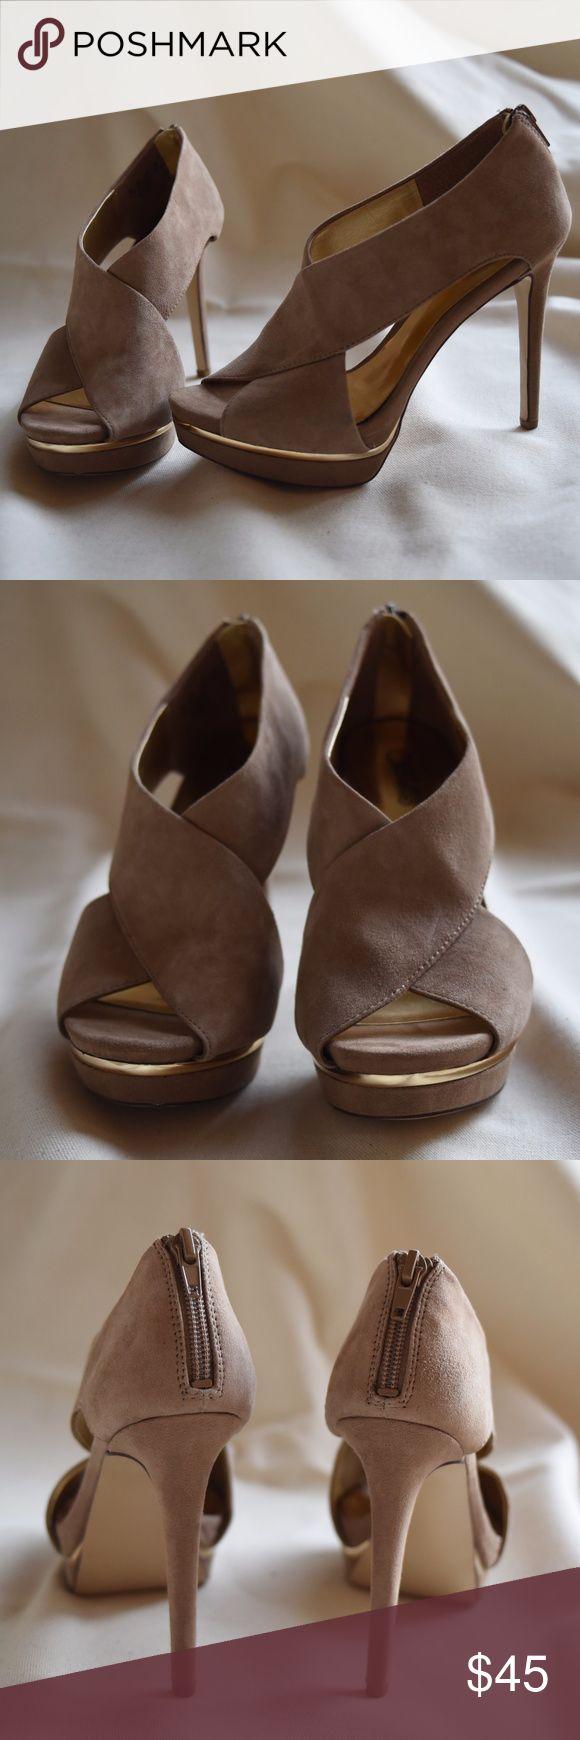 "Carlos Santana Suede Gold Platform Heels Carlos by Carlos Santana Heels  NEW without the Box. Blends nicely into the leg.  Gold platform accent.  Peep toe. Zipper back. Gold Sole. 2 1/2"" heel. 1/2"" platform. Size 6. Carlos Santana Shoes Heels"